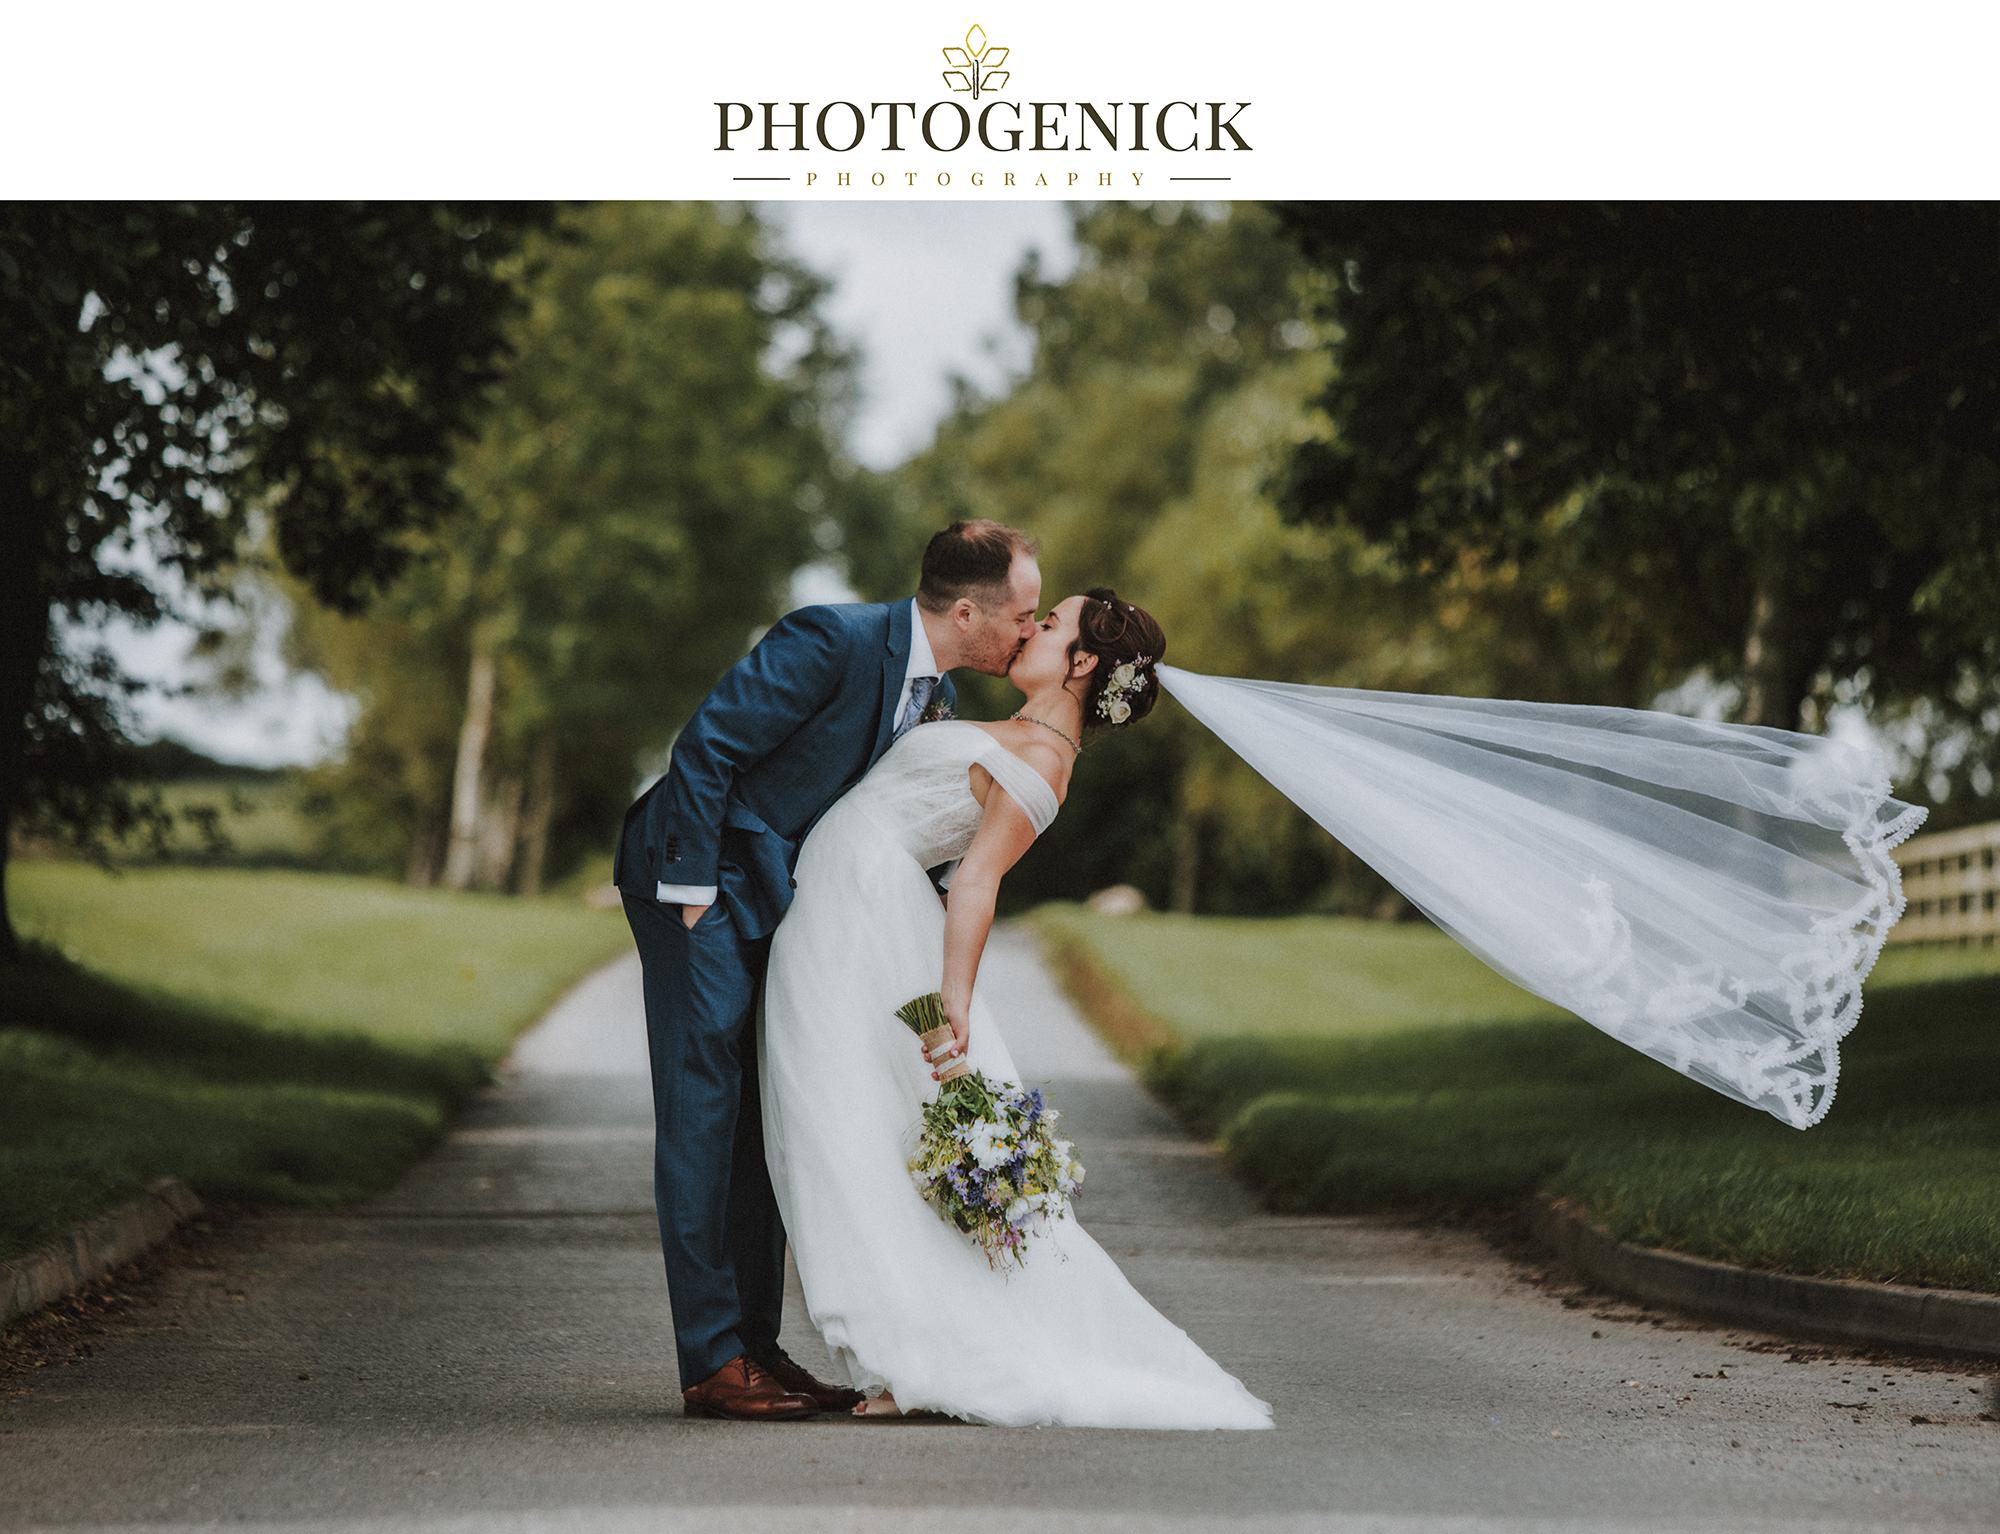 oldwalls gower welsh wedding photographer.jpg